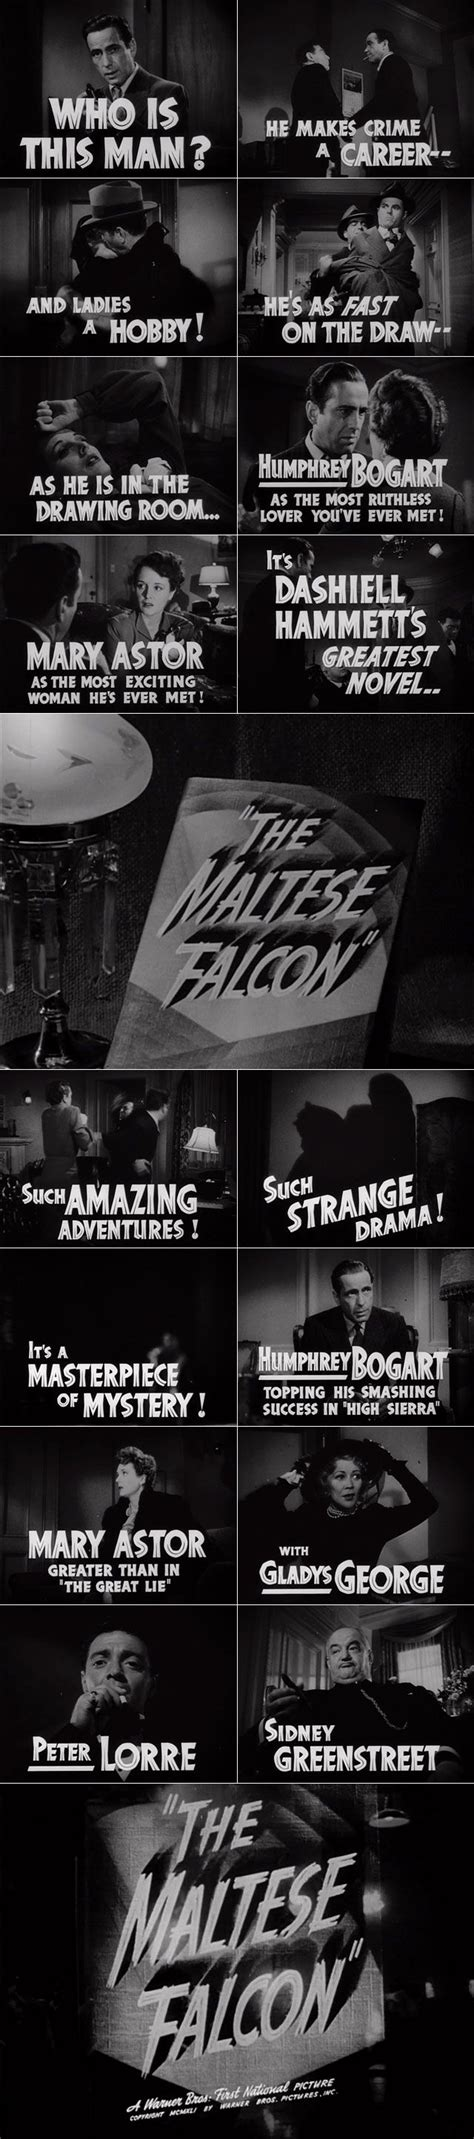 the maltese falcon collectors 1909621064 the maltese falcon 1941 trailer typography the movie title stills collection the maltese